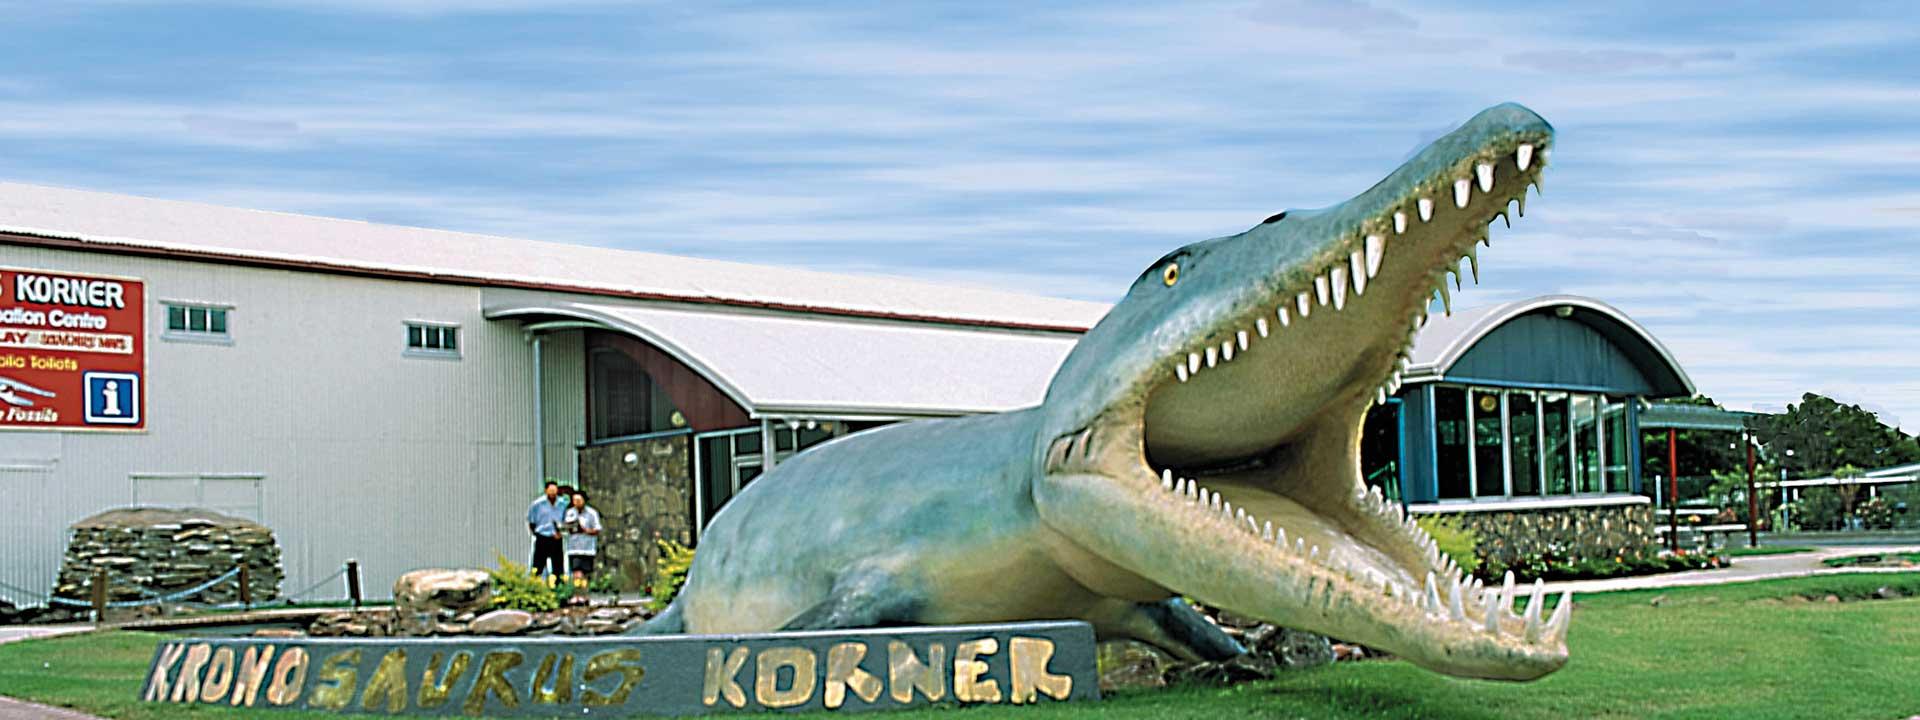 Richmond Korner, we promise we won't bite!